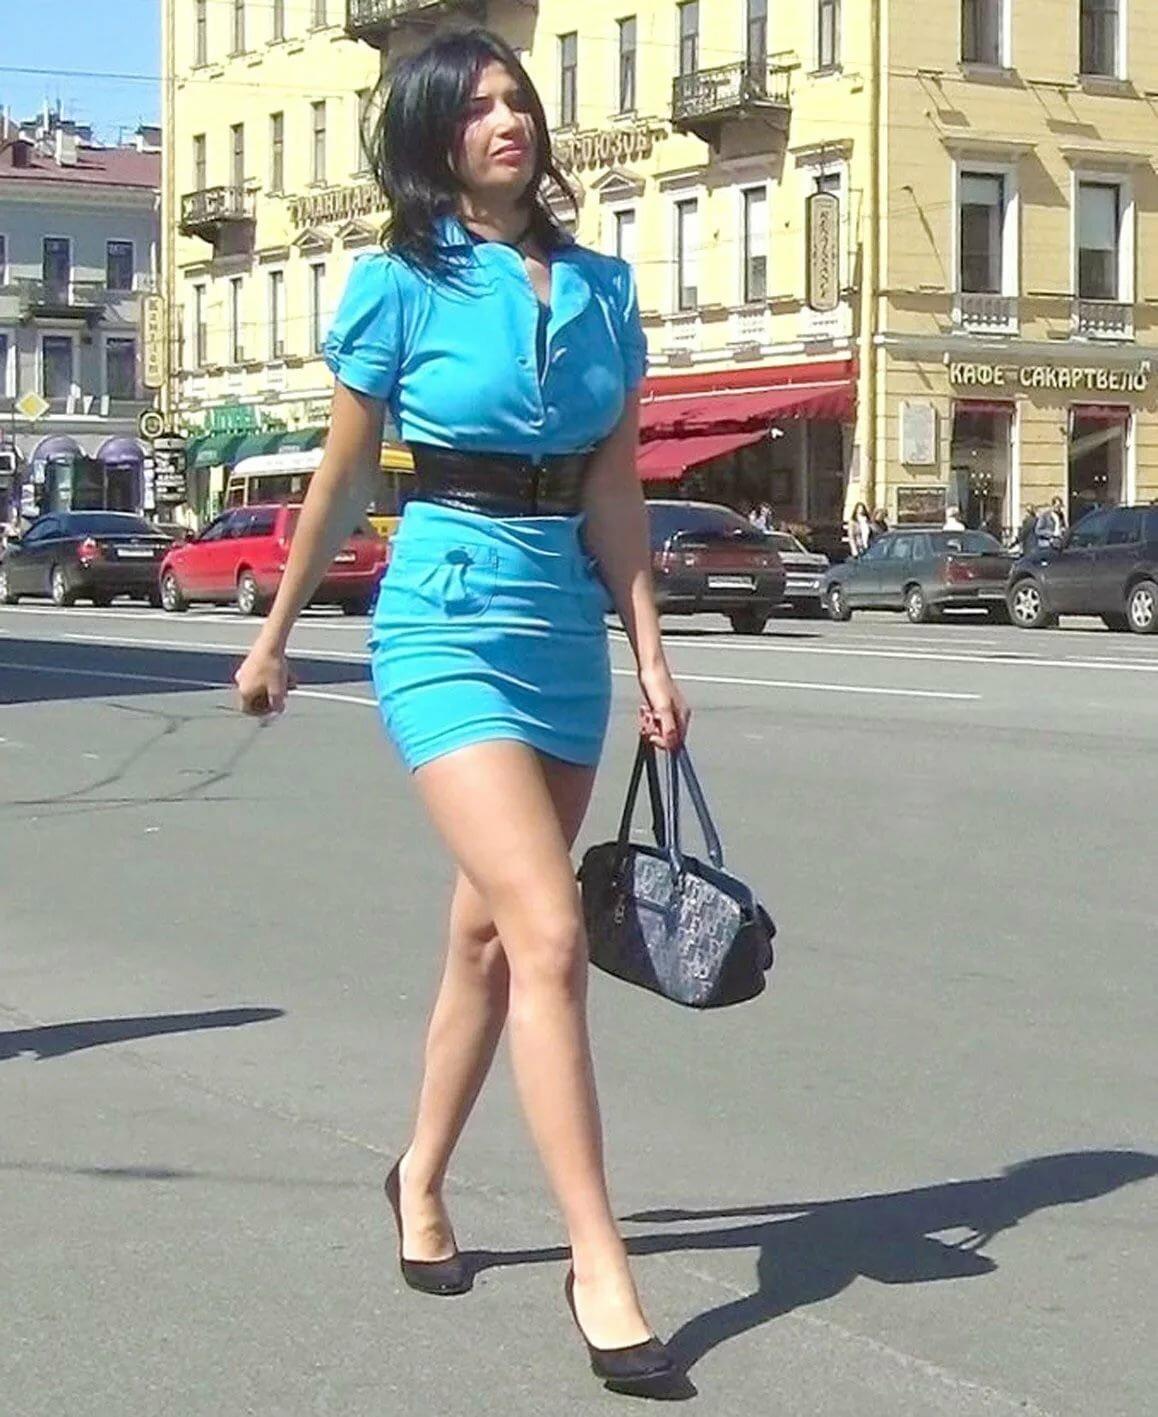 Фото в юбке на улице частное фото